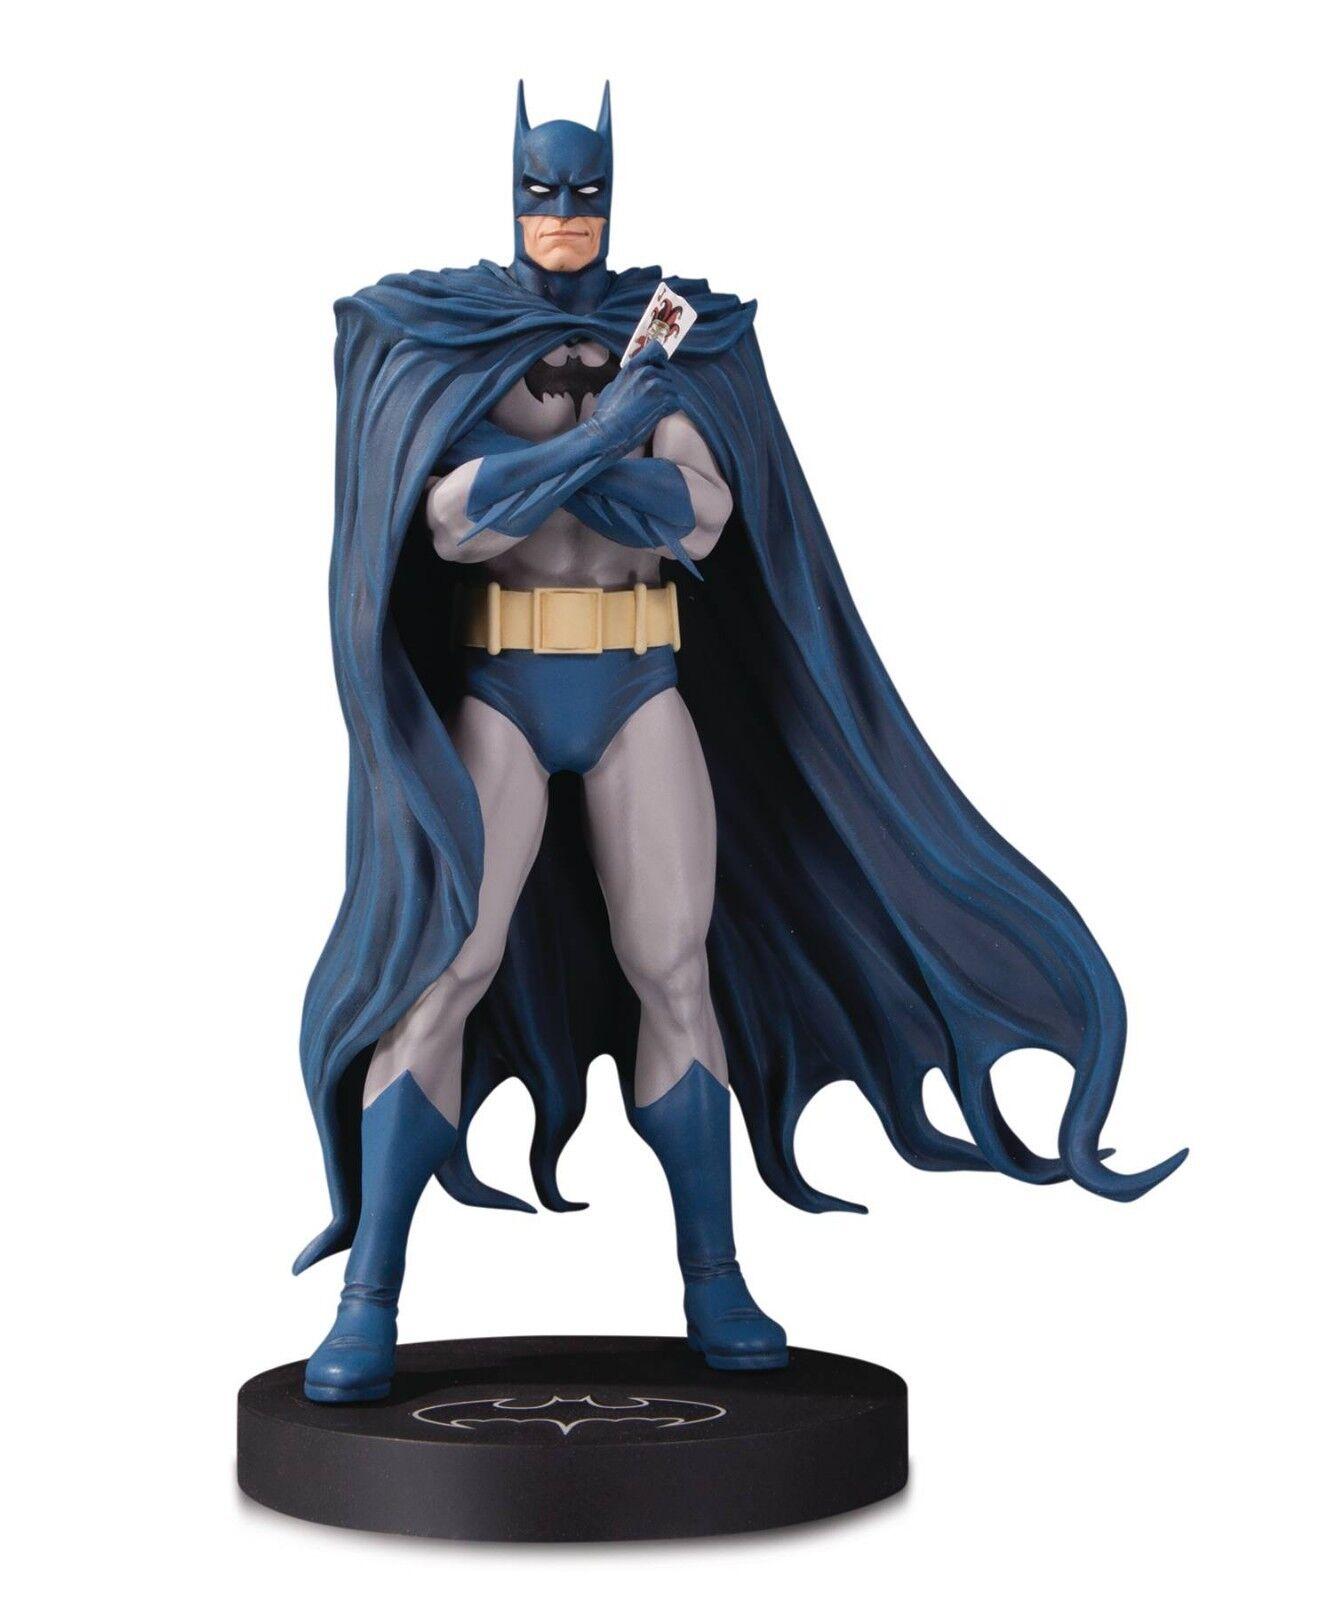 Dc - serie batman von brian bolland mini - statue - neu   boxen